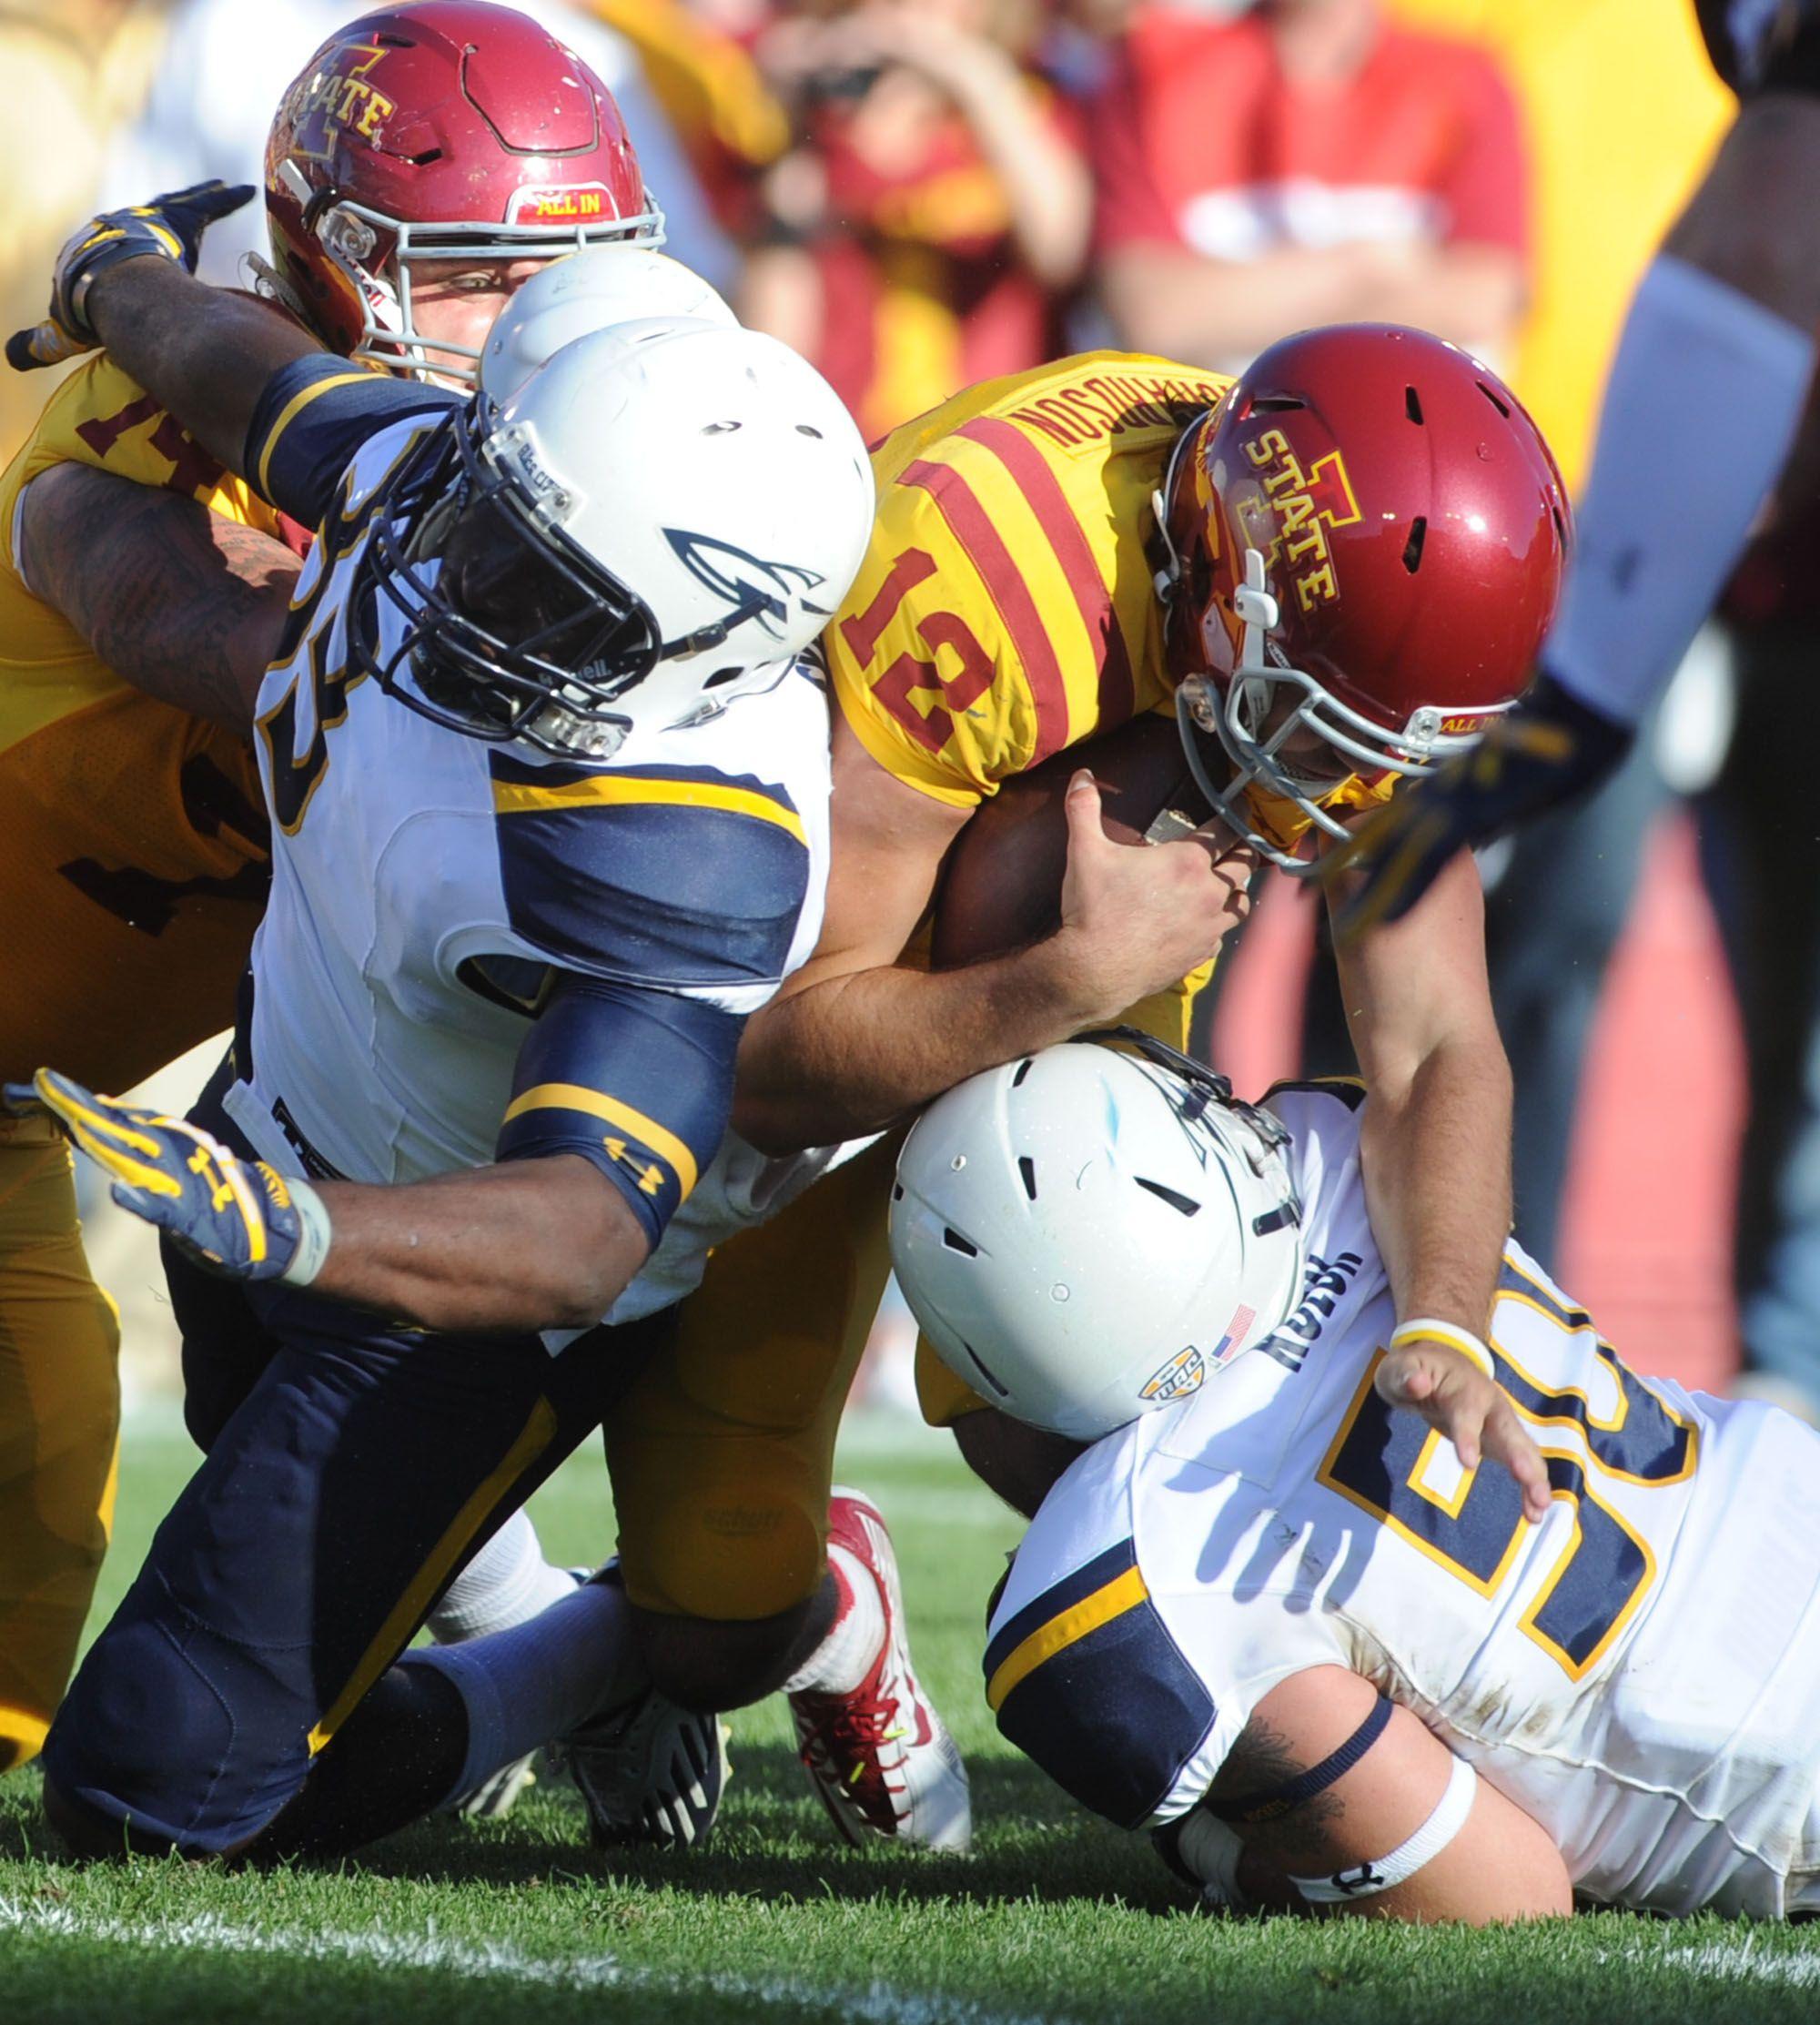 Iowa State Quarterback Sam Richardson Helped The Cyclone Beat